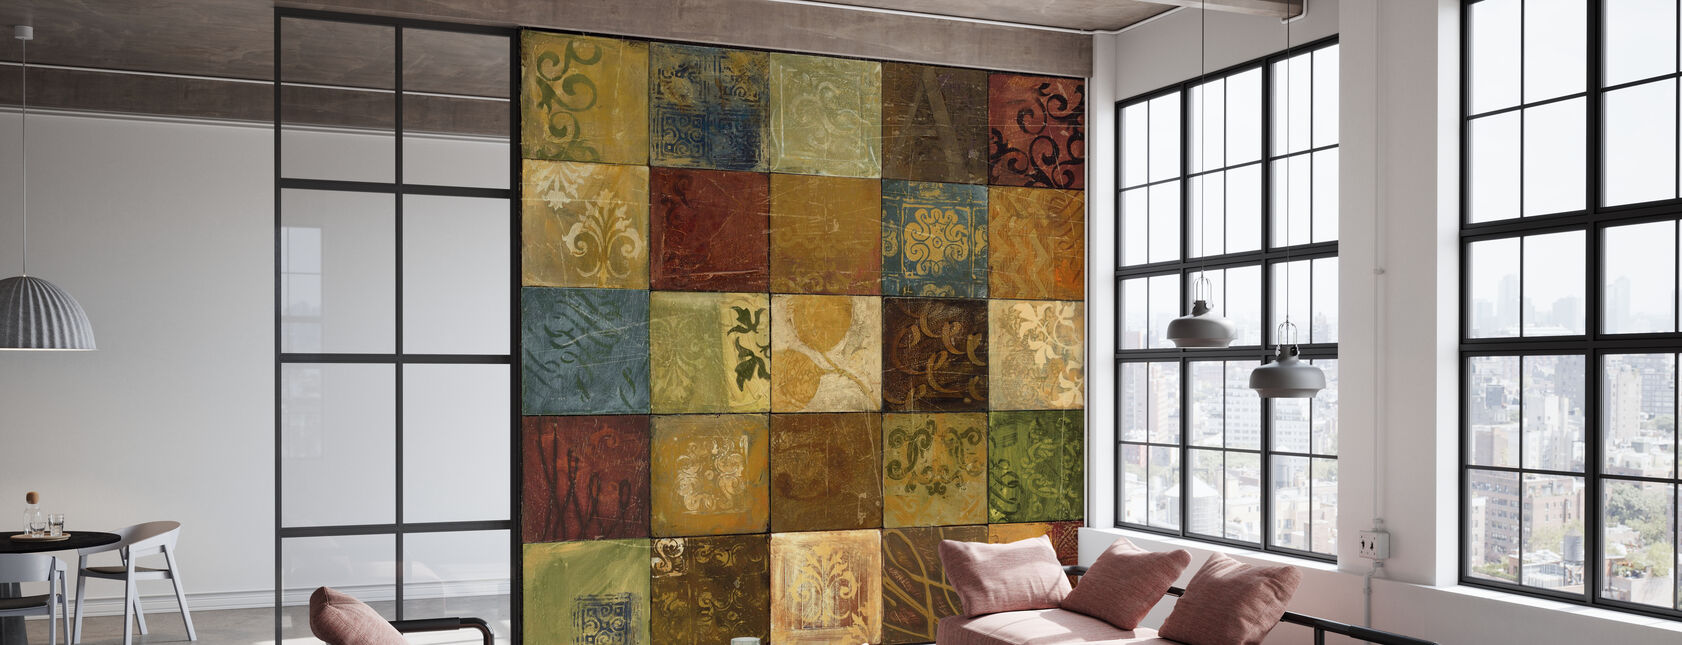 Avery Tillmon - Serendipity - Wag - Wallpaper - Office